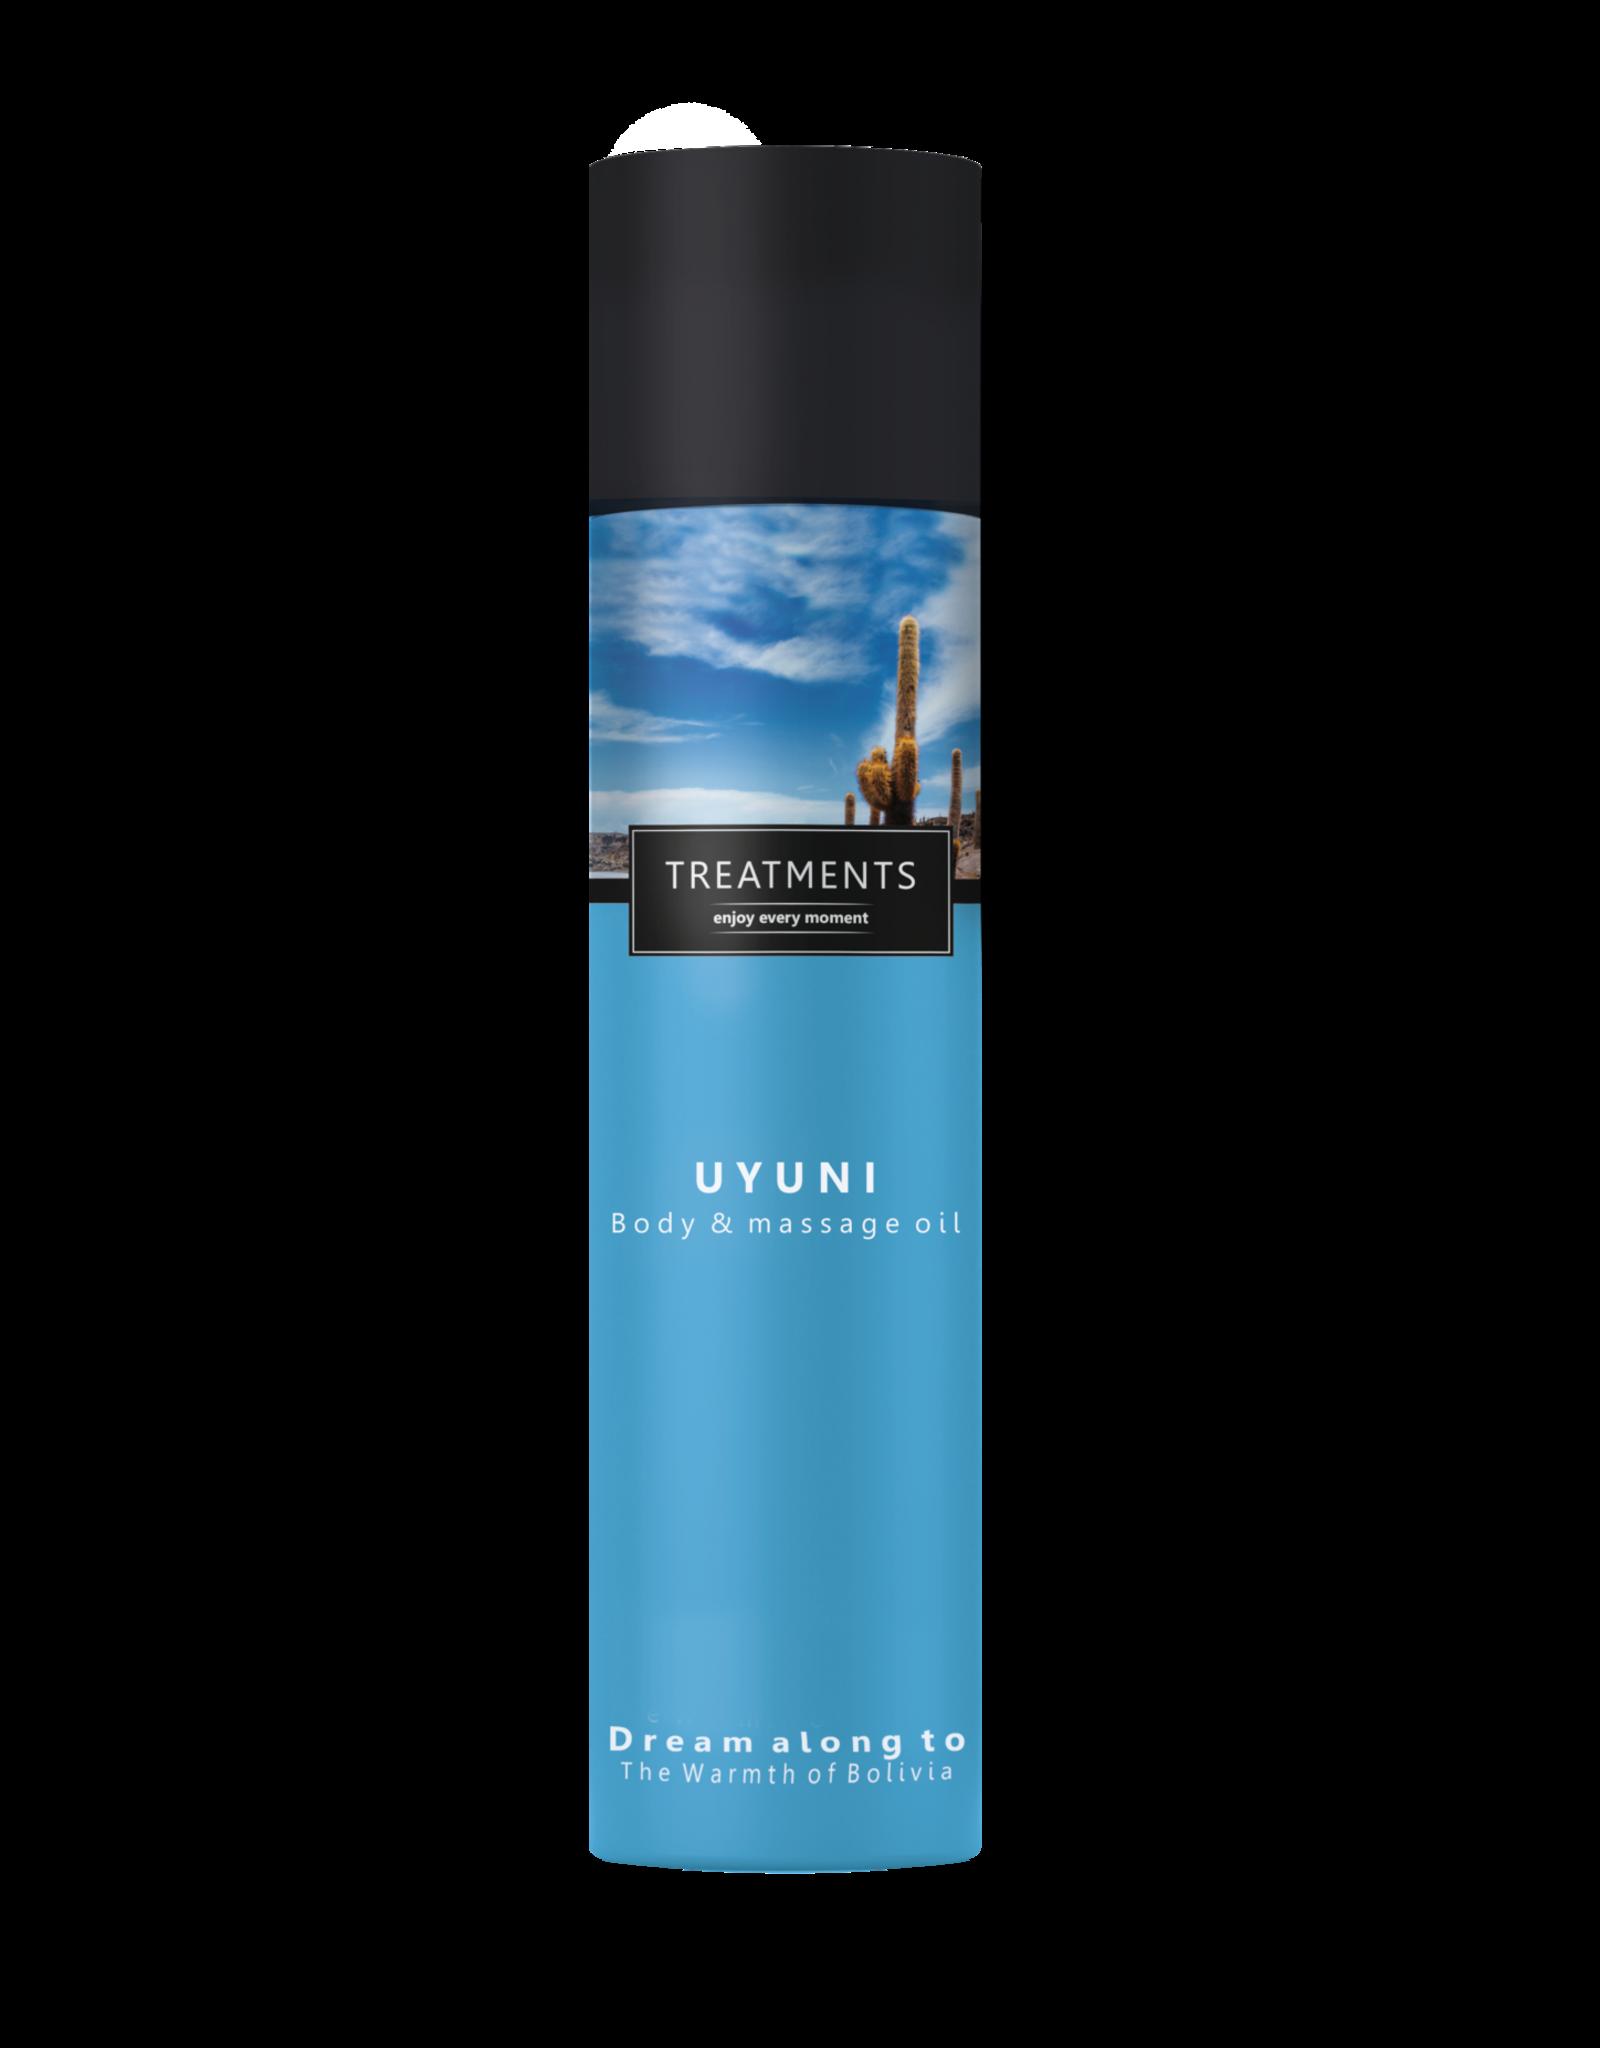 Treatments® Body & massage oil Uyuni 150 ml